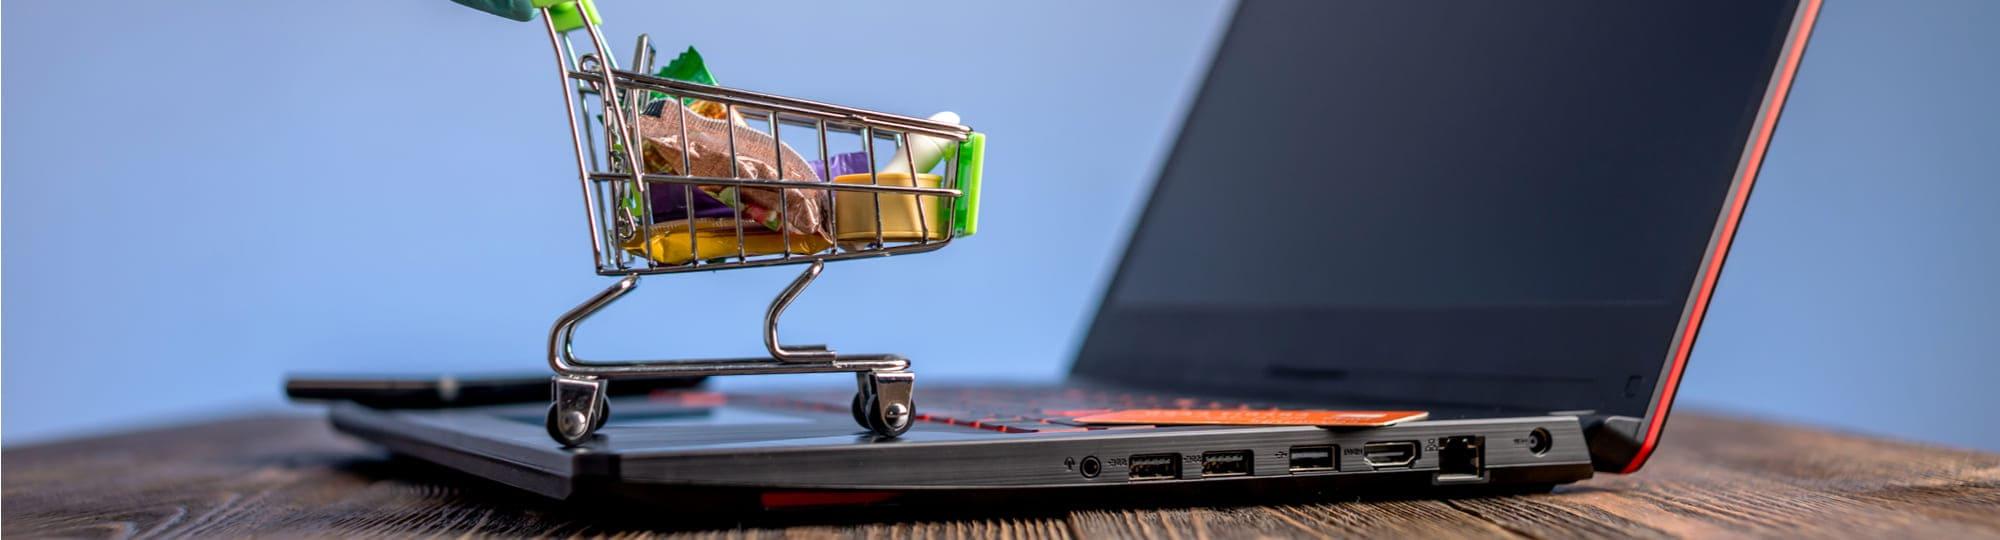 Direct-to-Customer (D2C) e-commerce